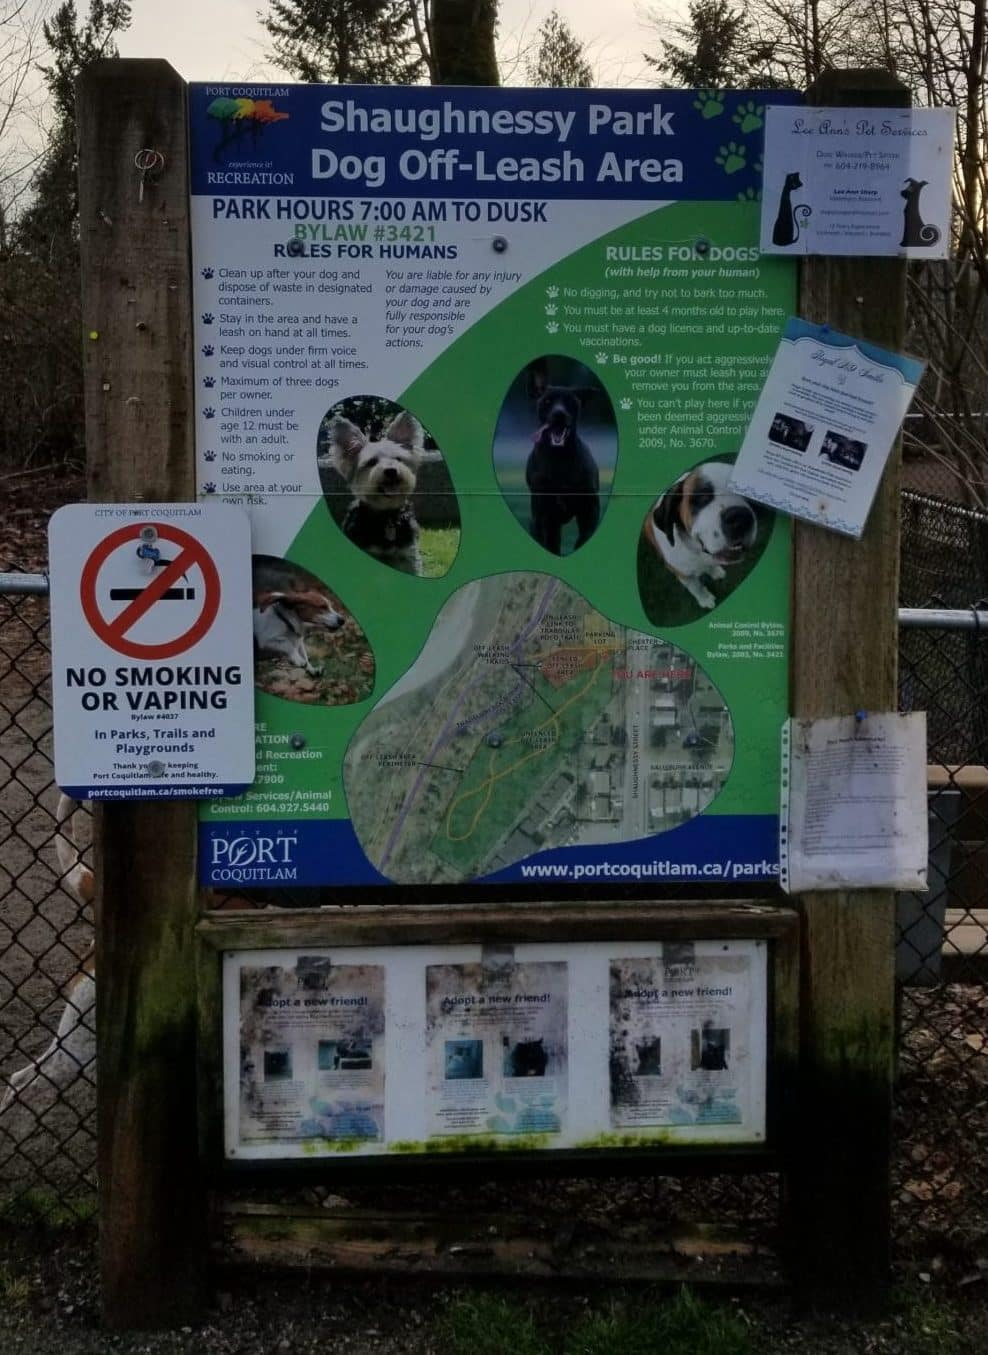 Shaughnessy Park Off-Leash Dog Park - Port Coquitlam - BC (4)